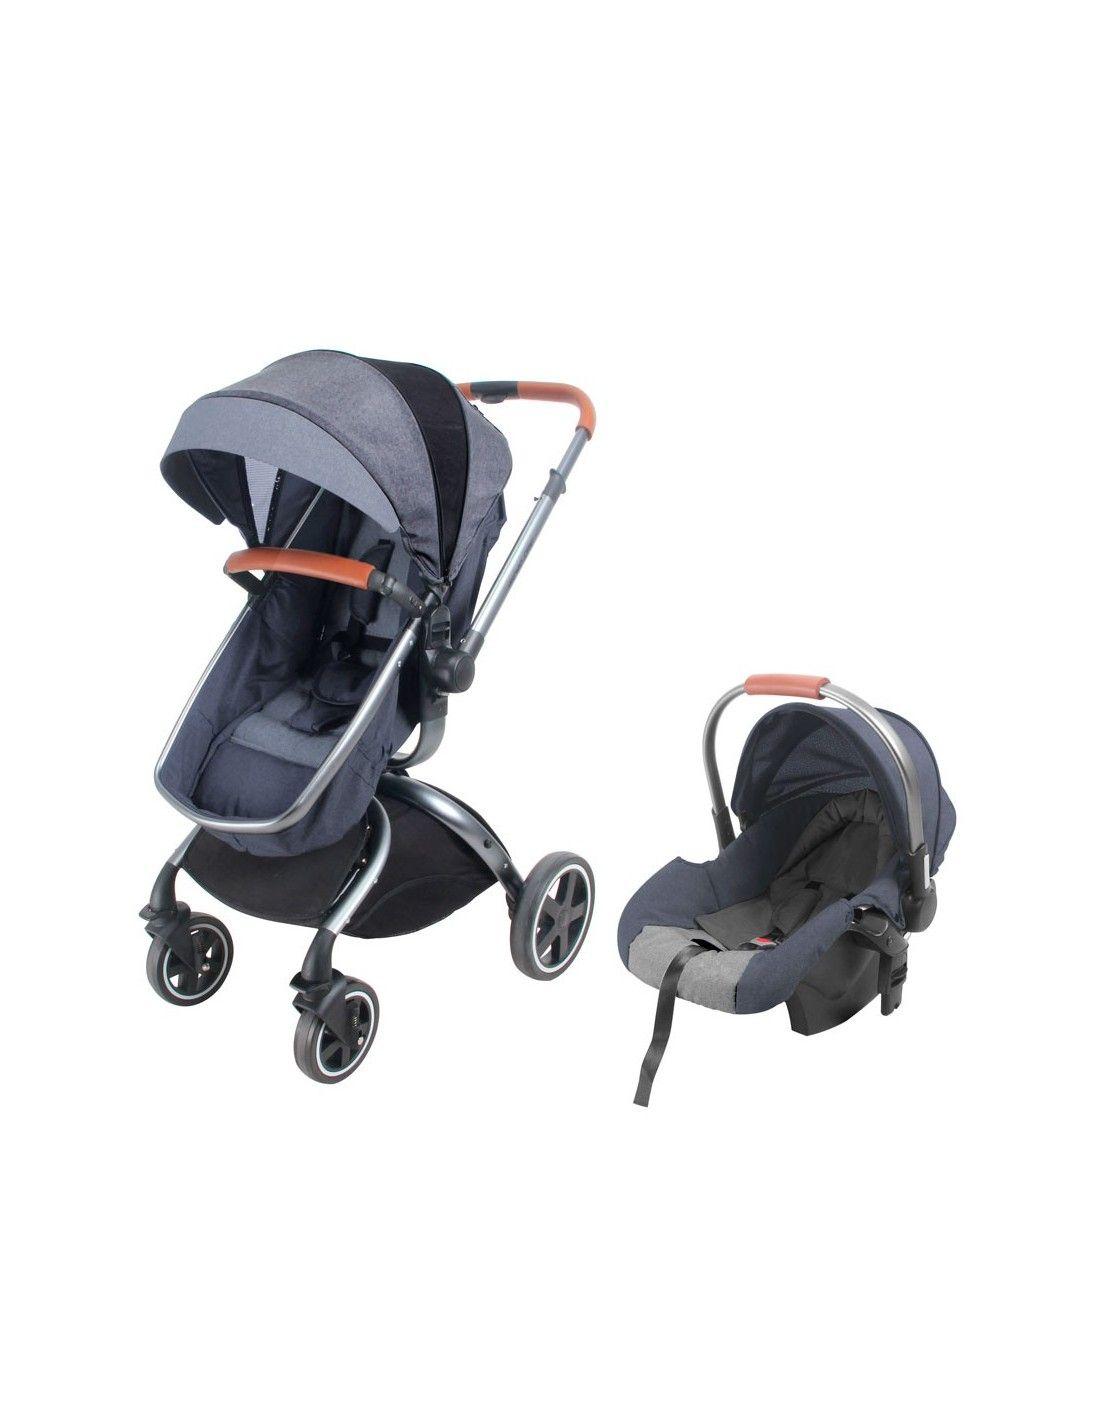 208e3f11d Coche cuna TRavel System Baby Kits F80 - Plomo